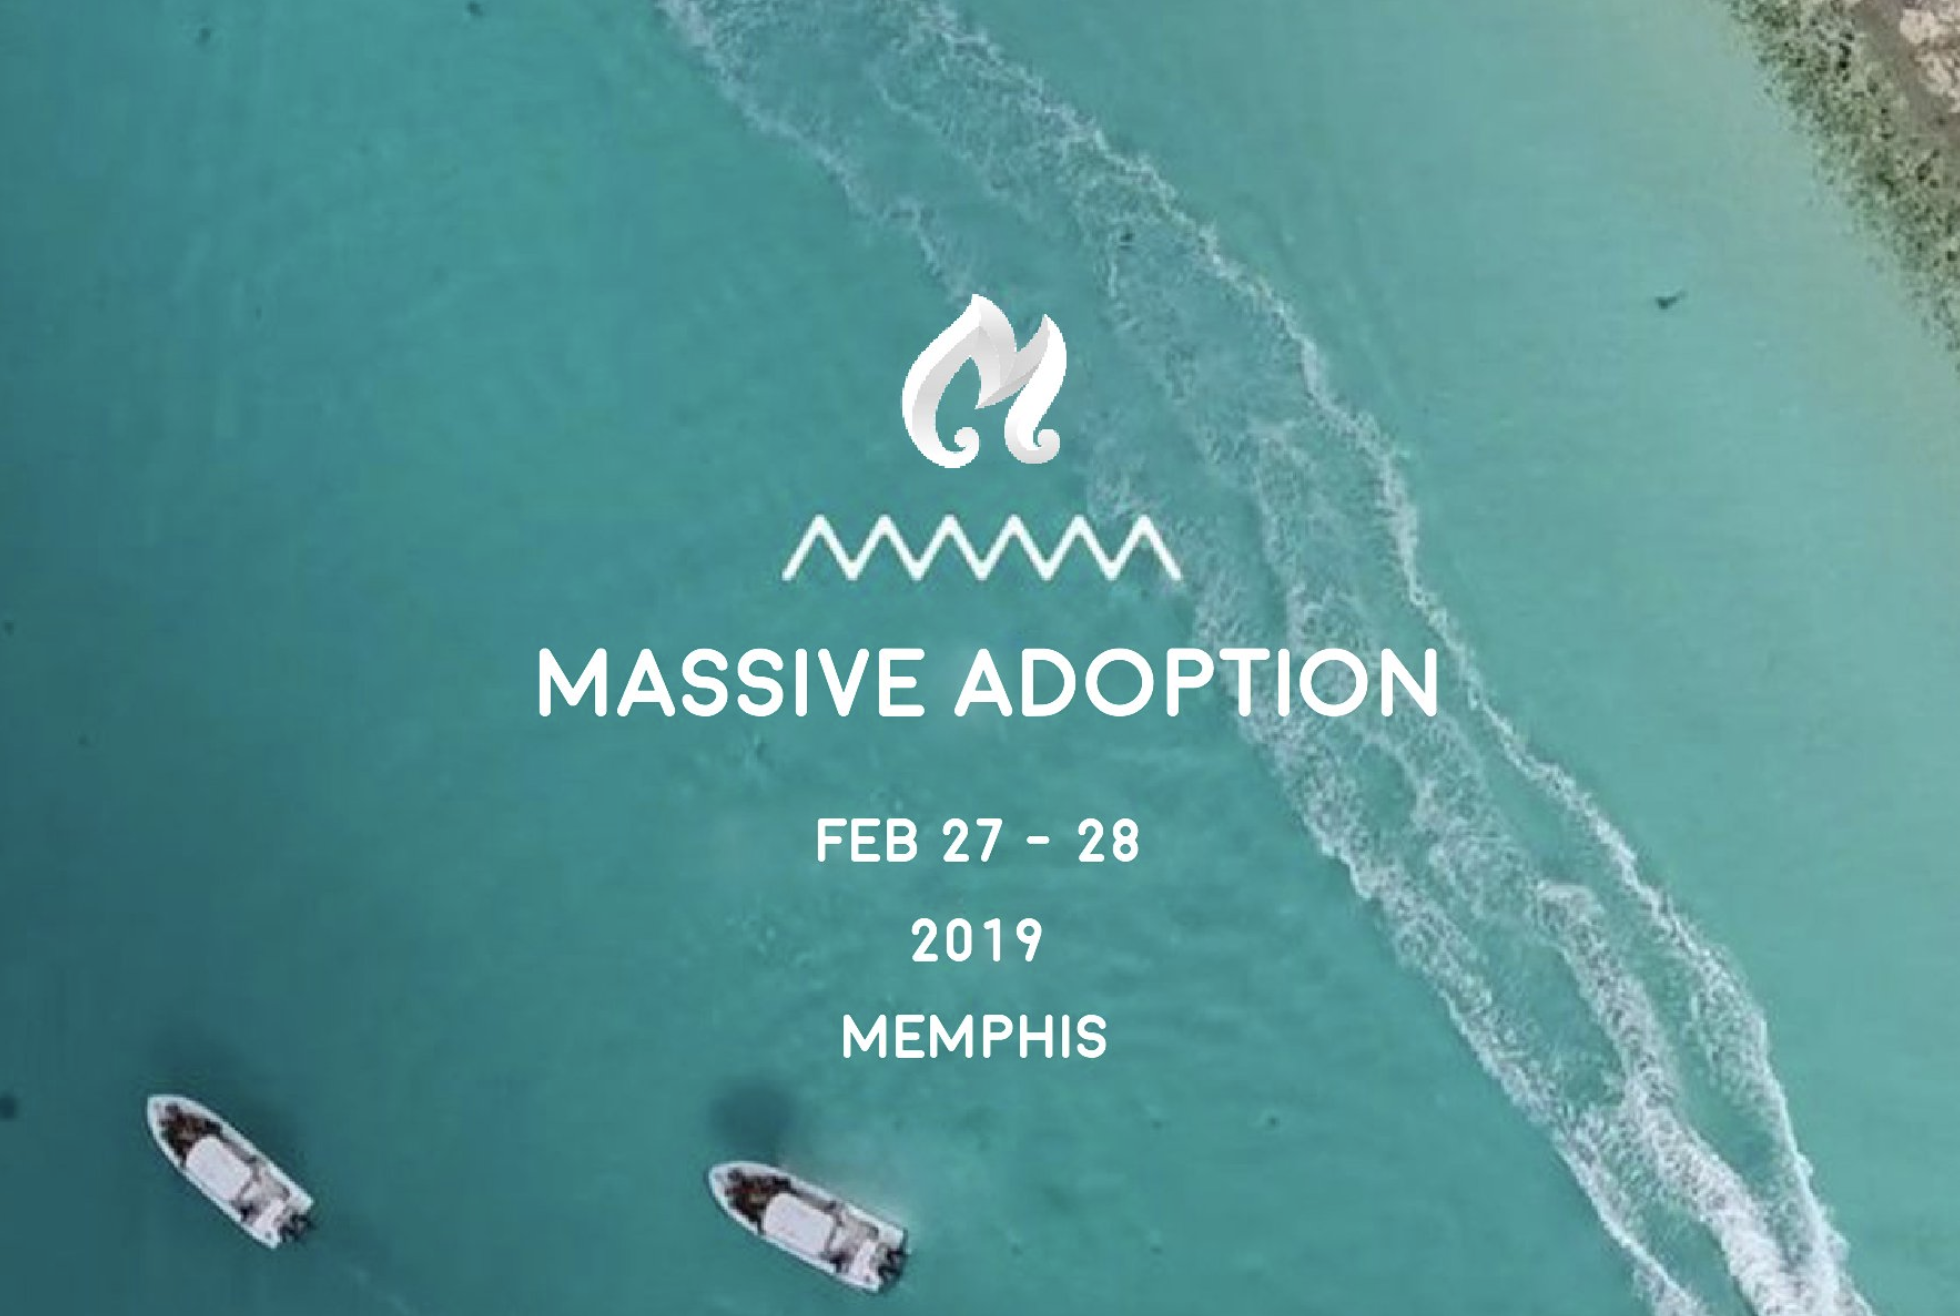 Massive Adoption